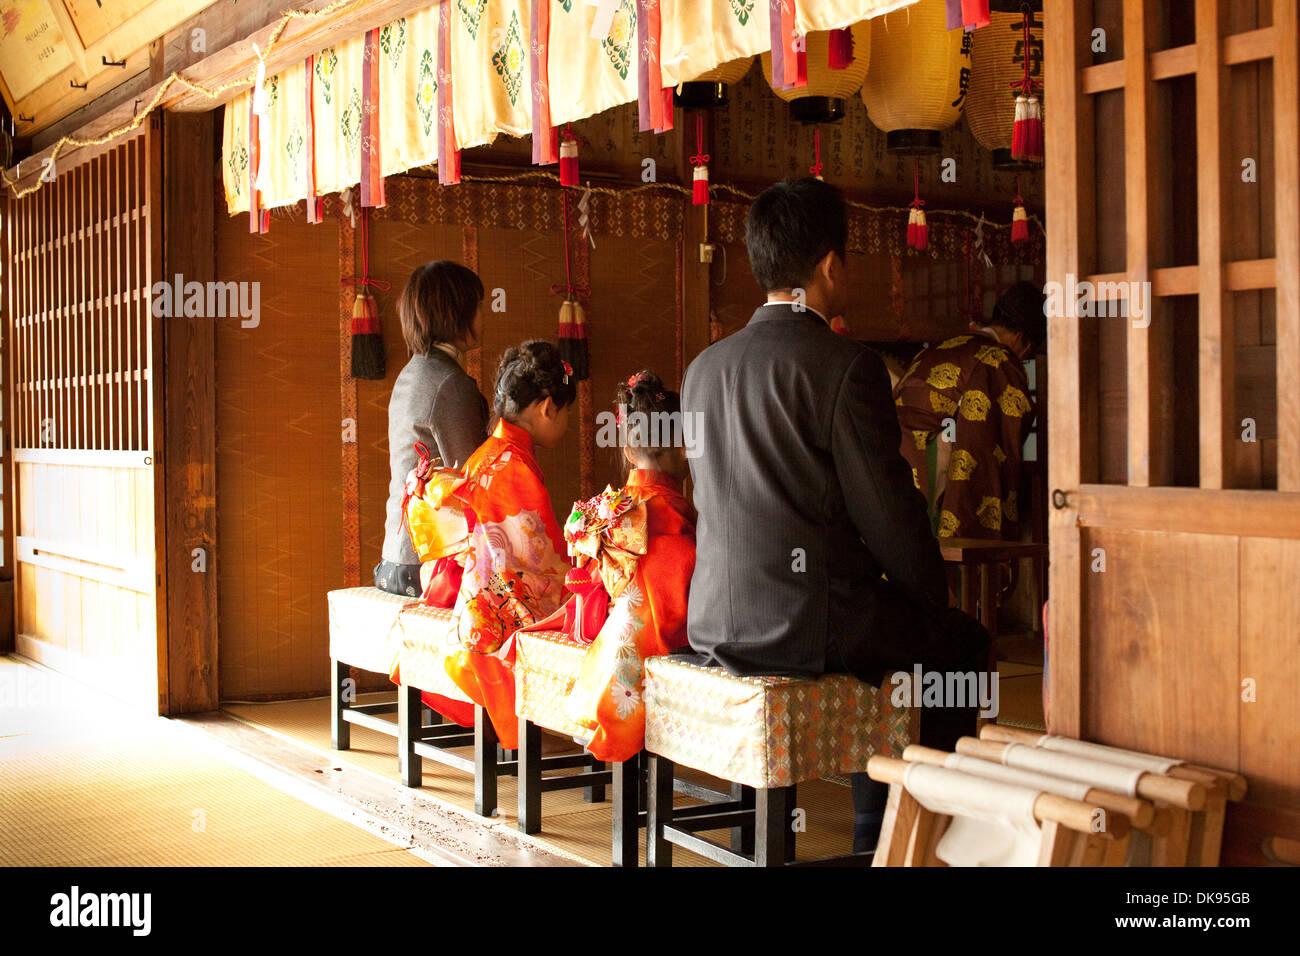 Shichi-go-san Japanese ceremony - Stock Image